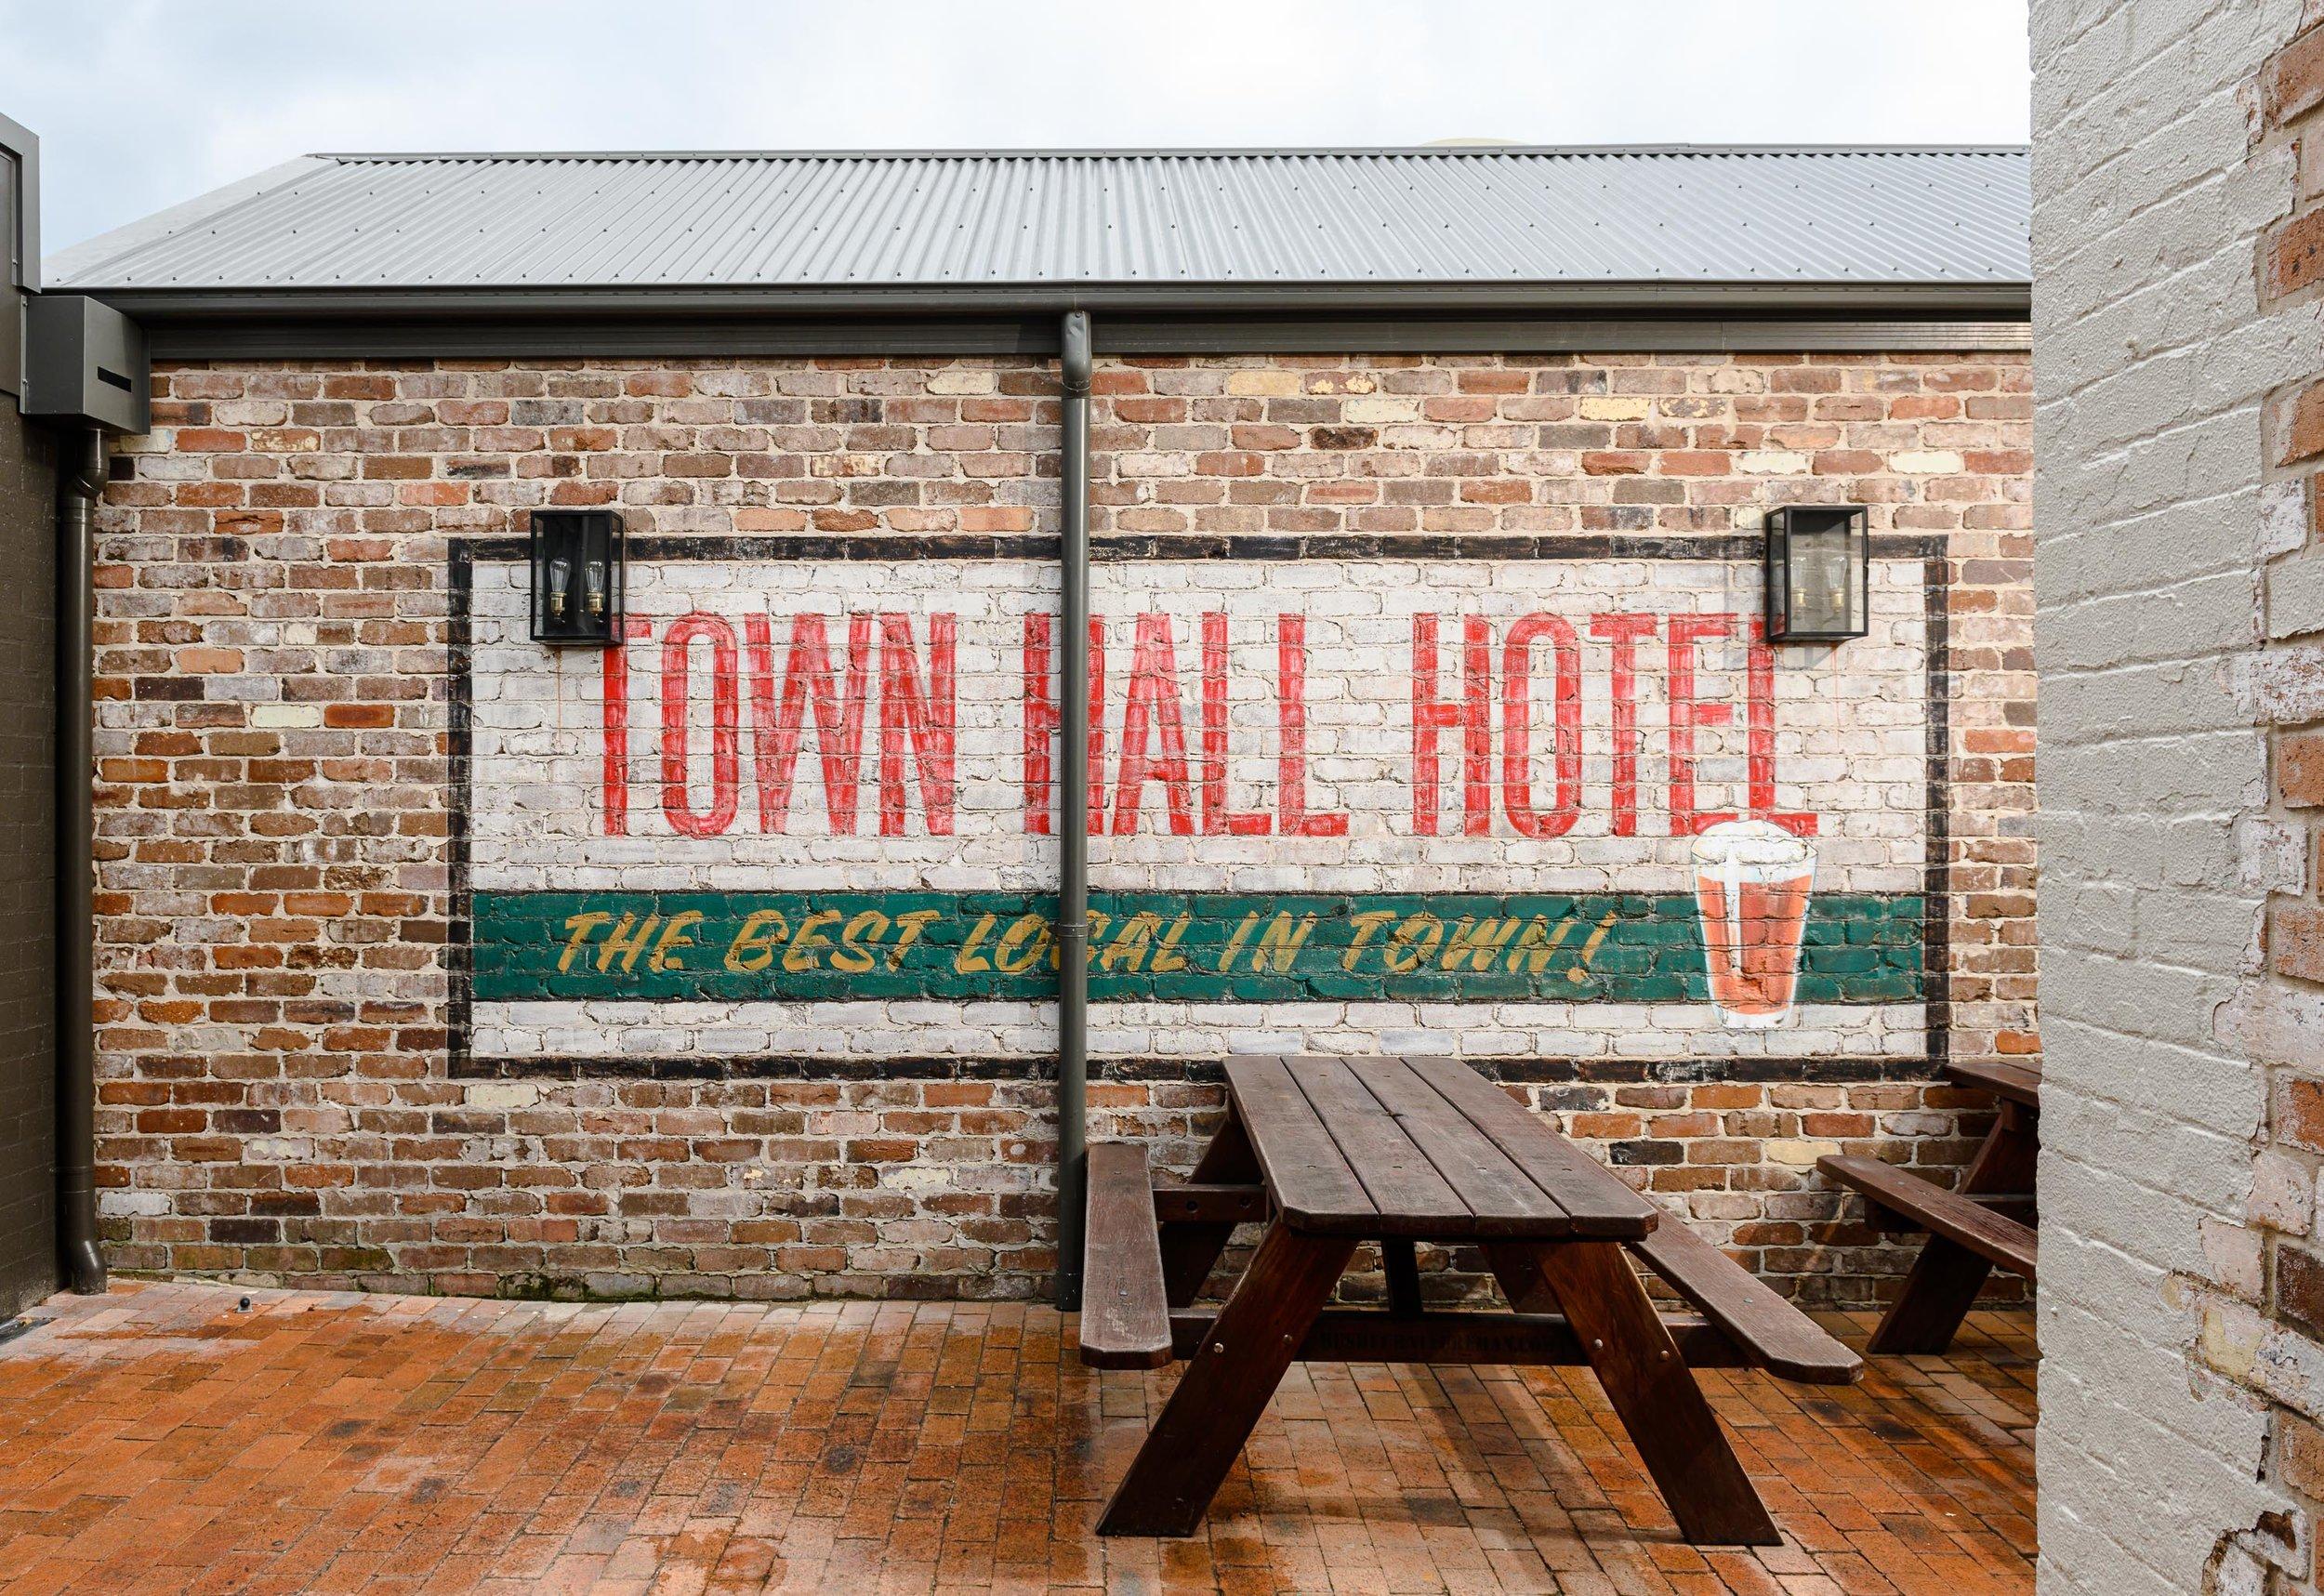 FabriArchitecture_TheTownhallHotel_Newcastle_NSW_CREDIT_DominicLoneragan_030719_0337.jpg